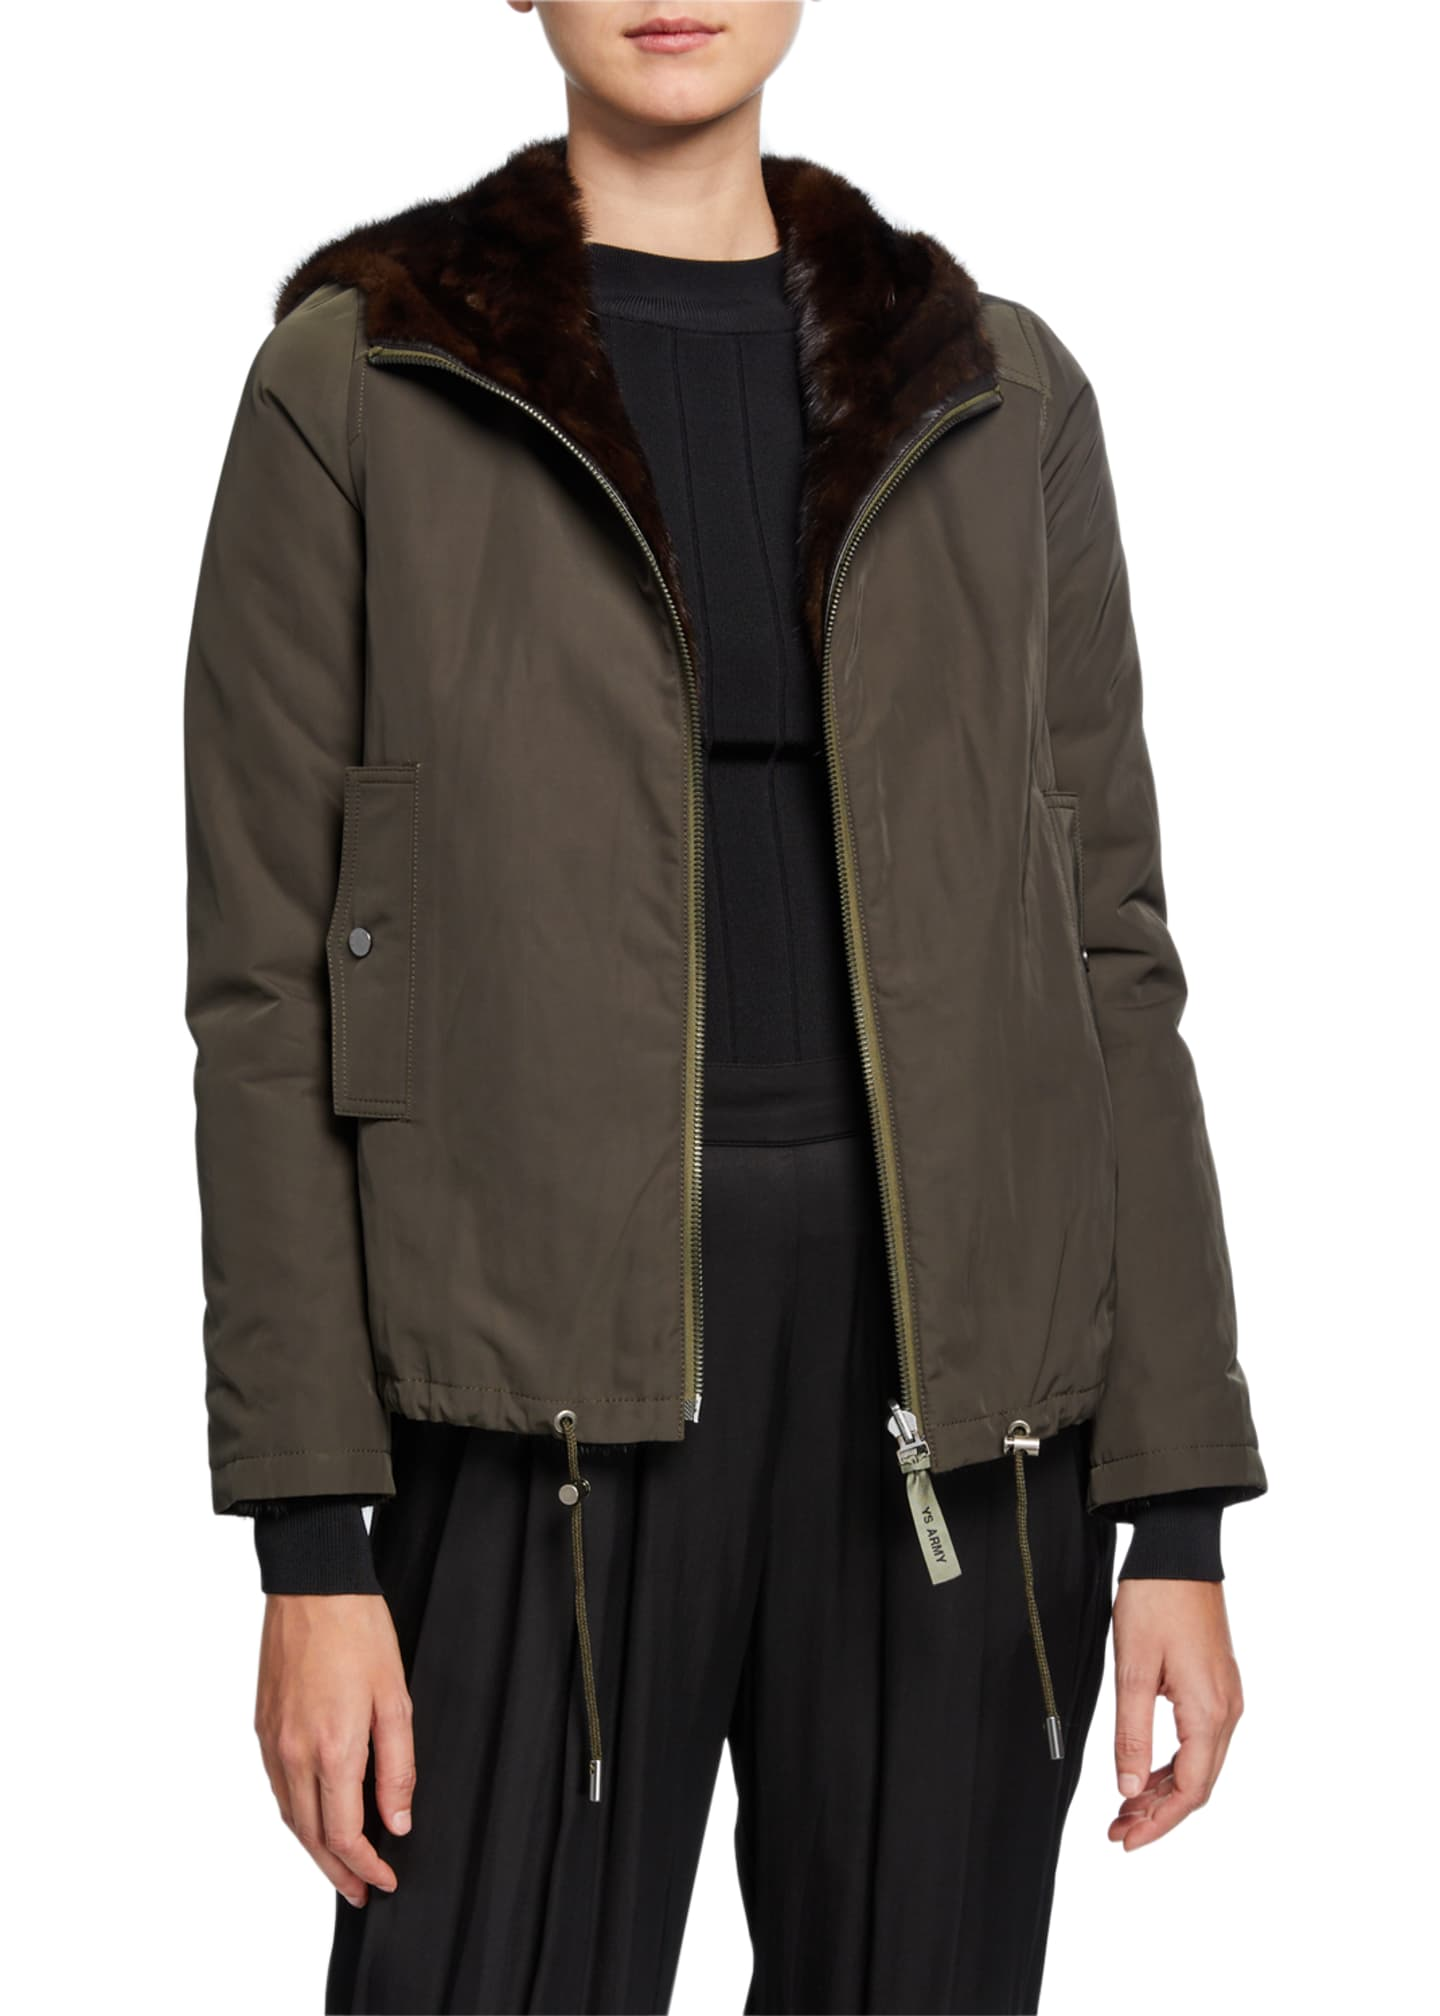 Army By Yves Salomon Reversible Mink Fur Jacket